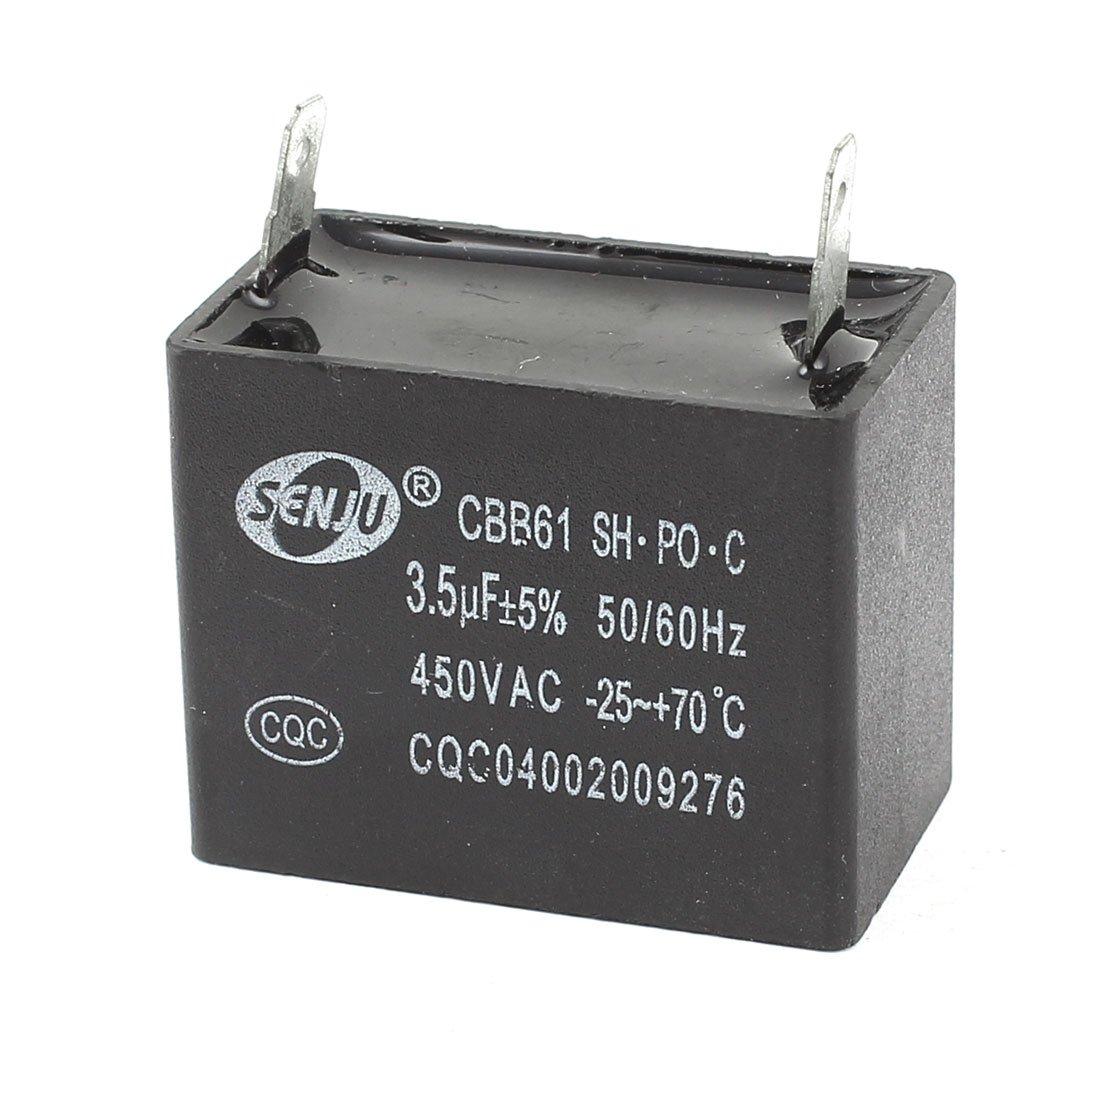 Aexit 3.5uf 5% AC 450 V 2PINS Film polypropylène Motor Run condensateur CBB61 410Y276